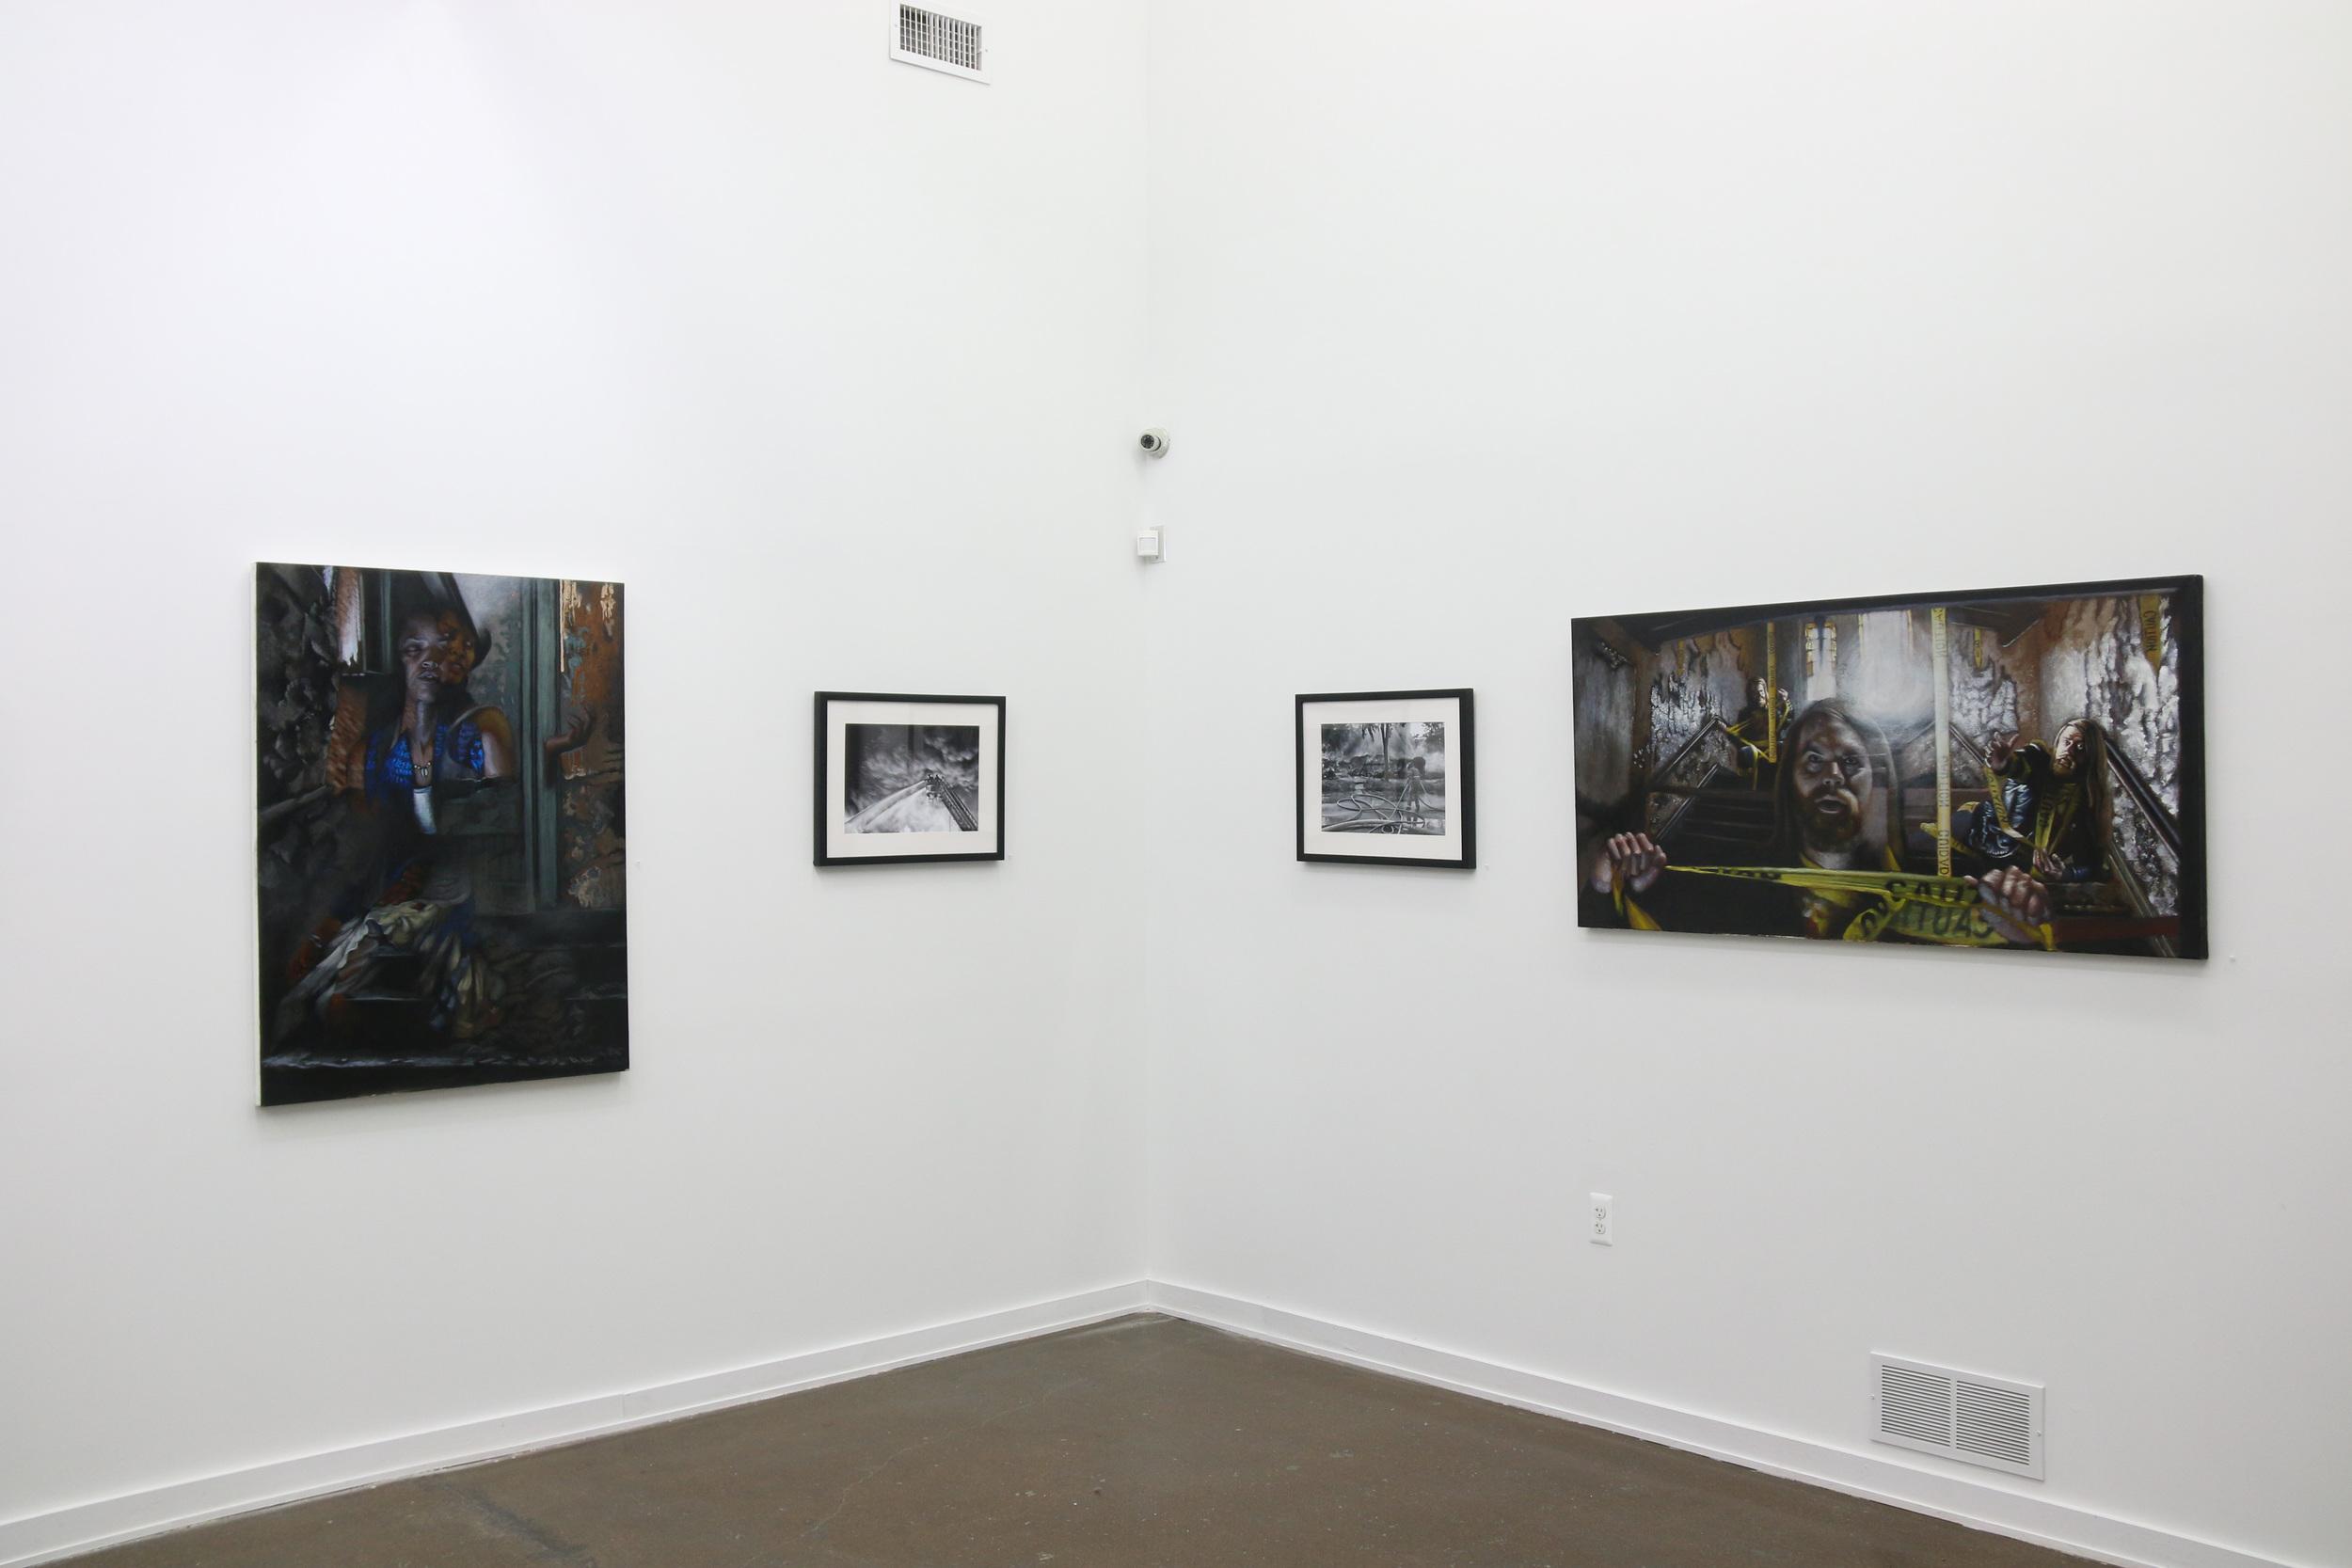 Galerie Camille Install-3.jpg